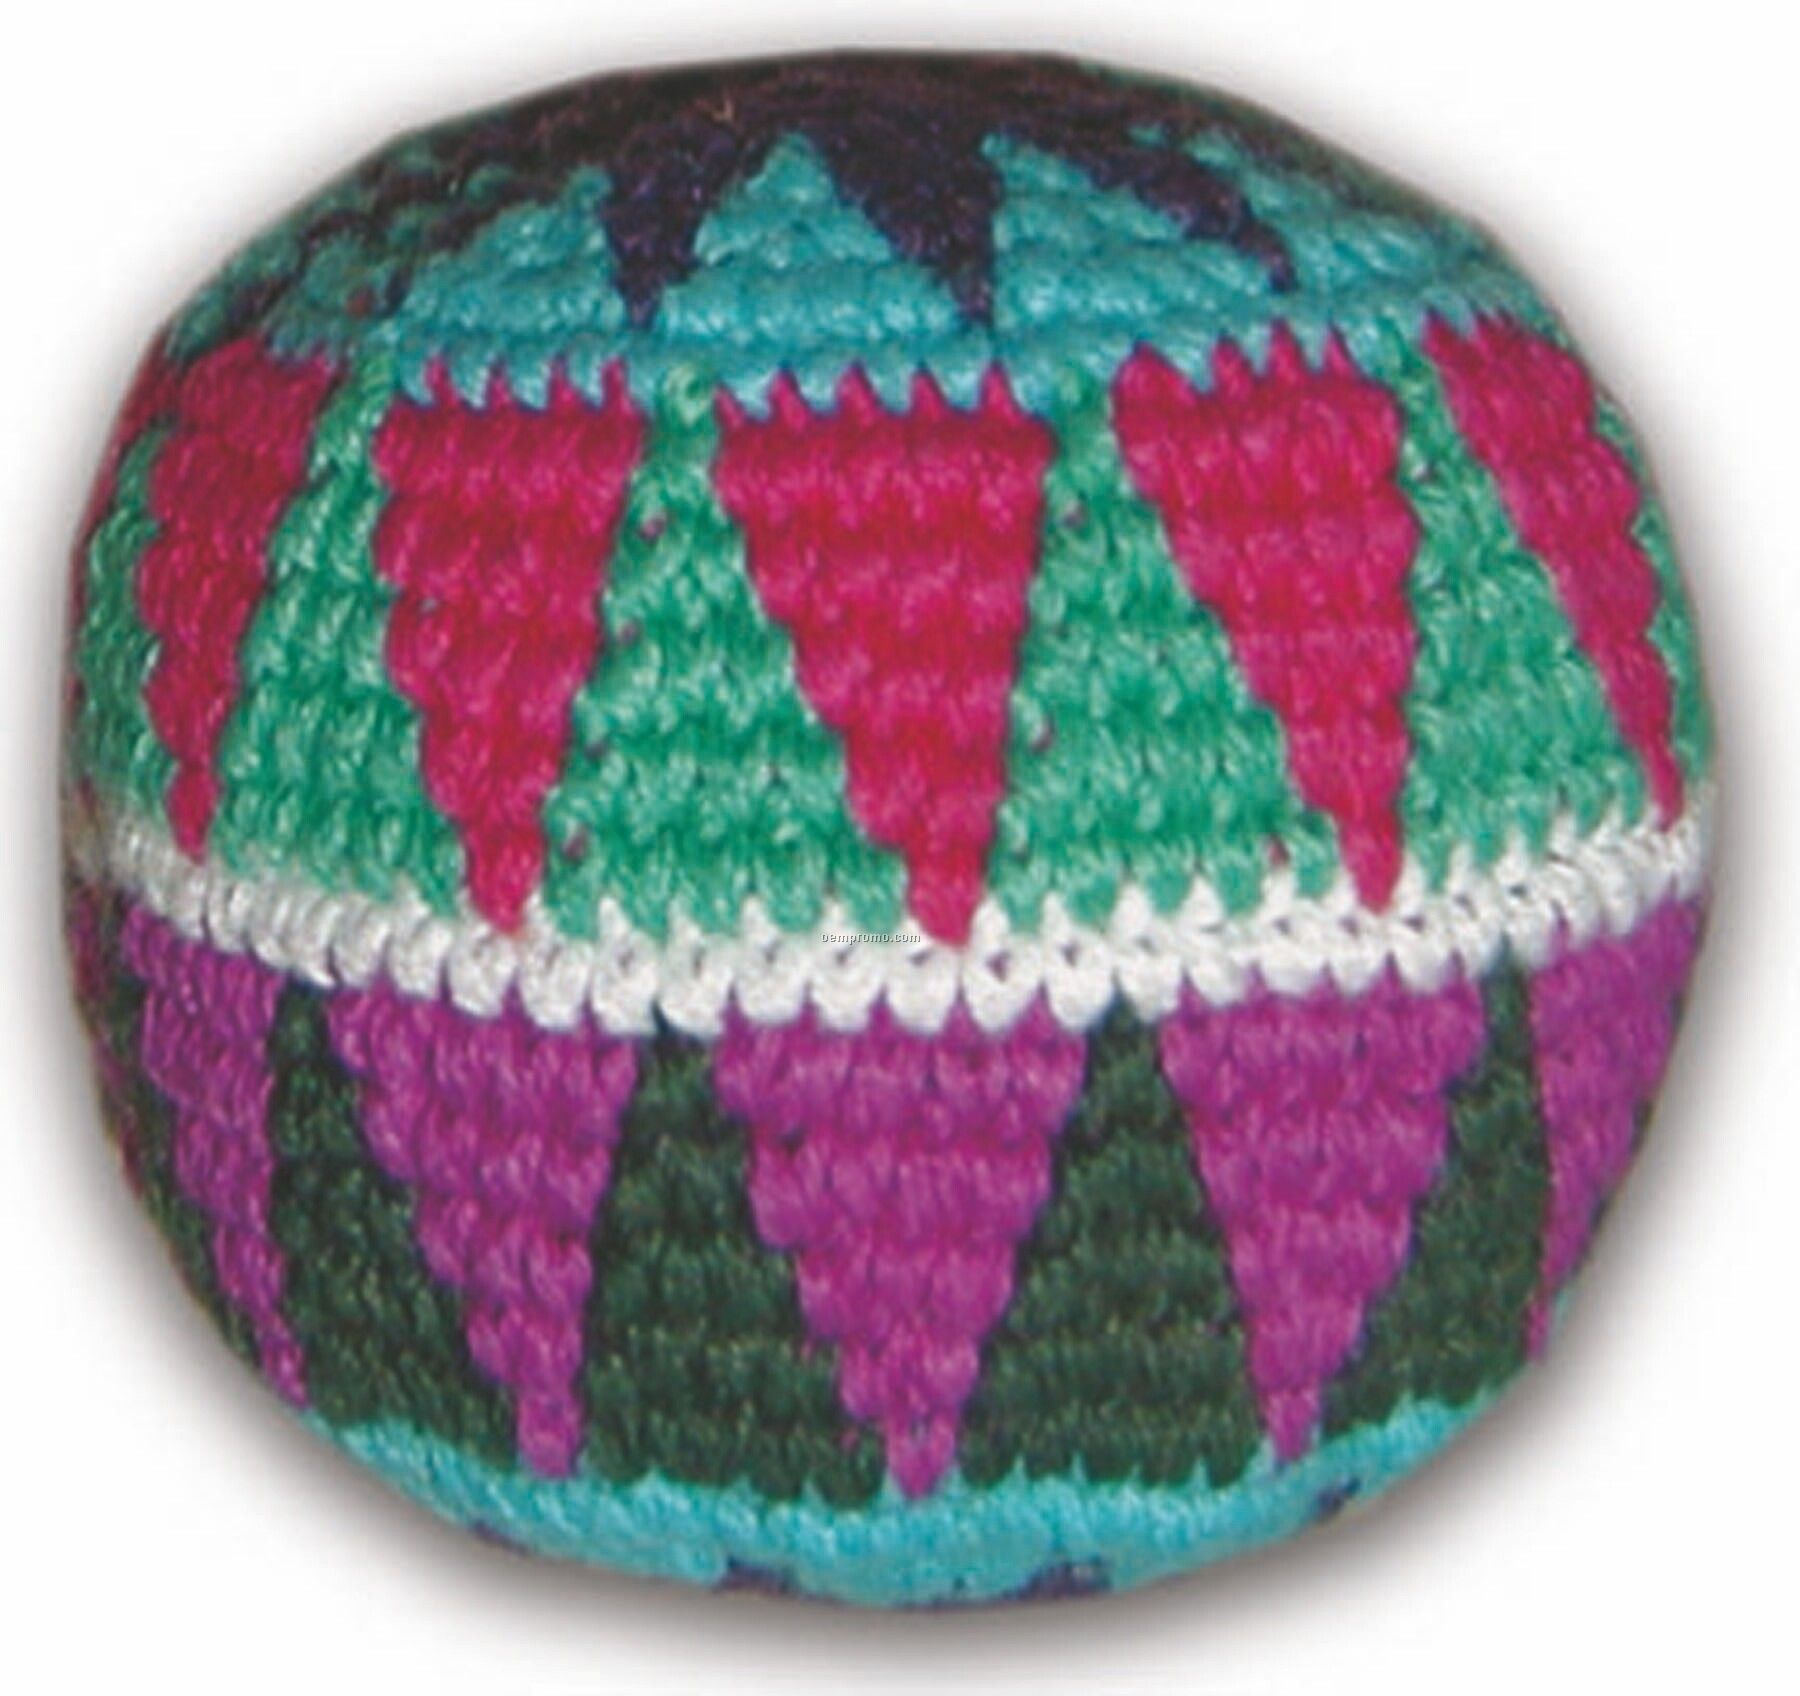 Guatemalan Crocheted Footbag